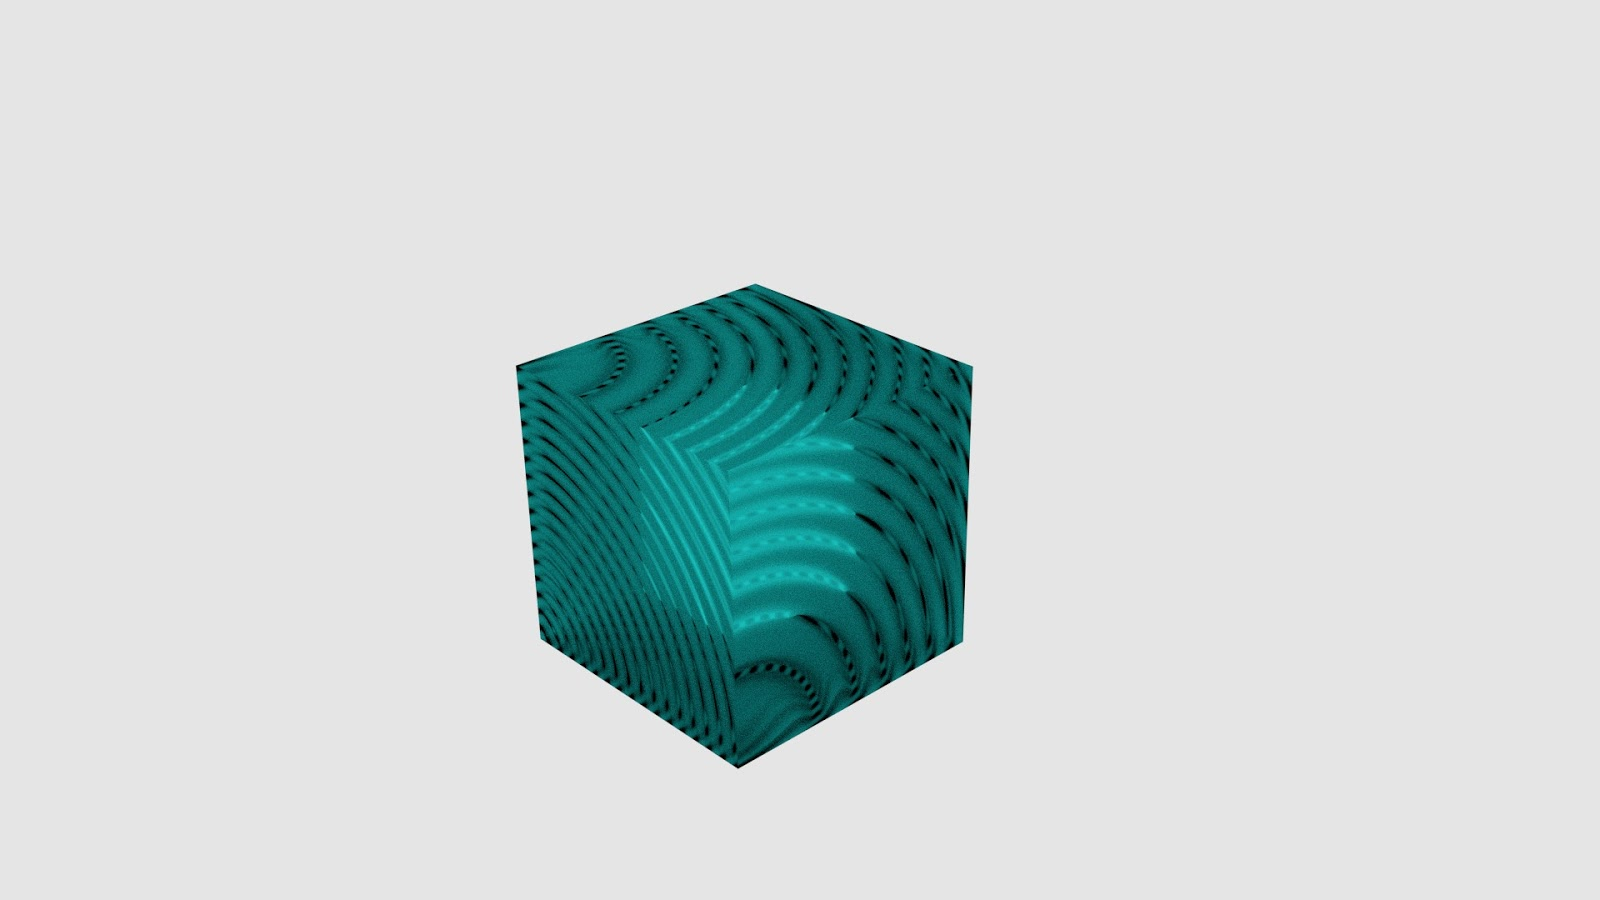 Ashish Name 3d Wallpaper 3d Hd Wallpaper Square Wave Effects Tixmotion Jocks